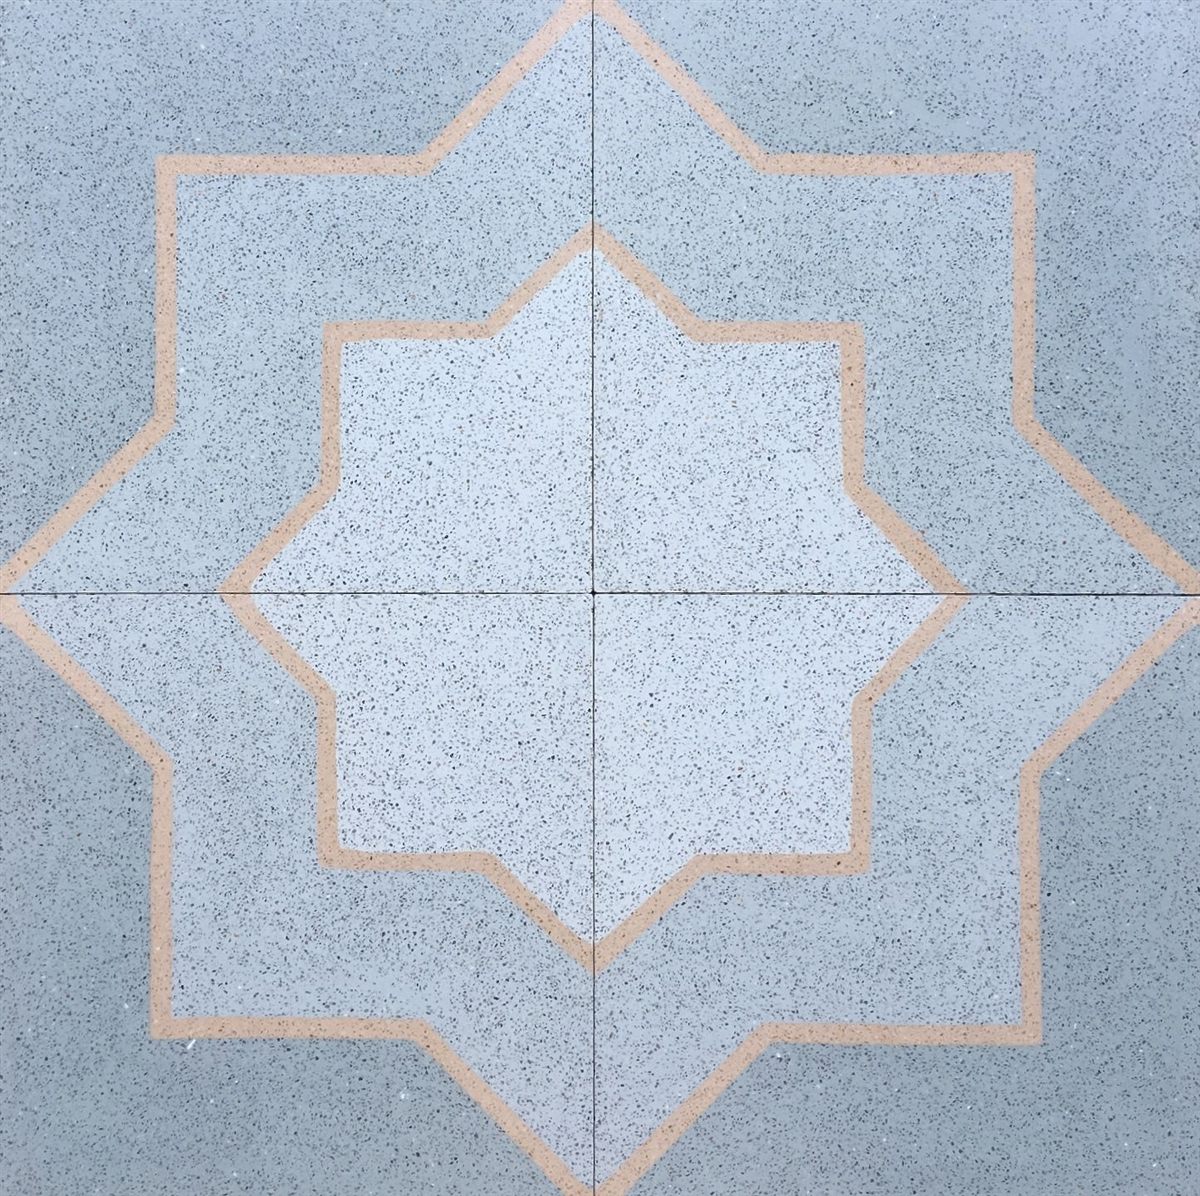 8x8 star and cross matte encaustic cement floor tile